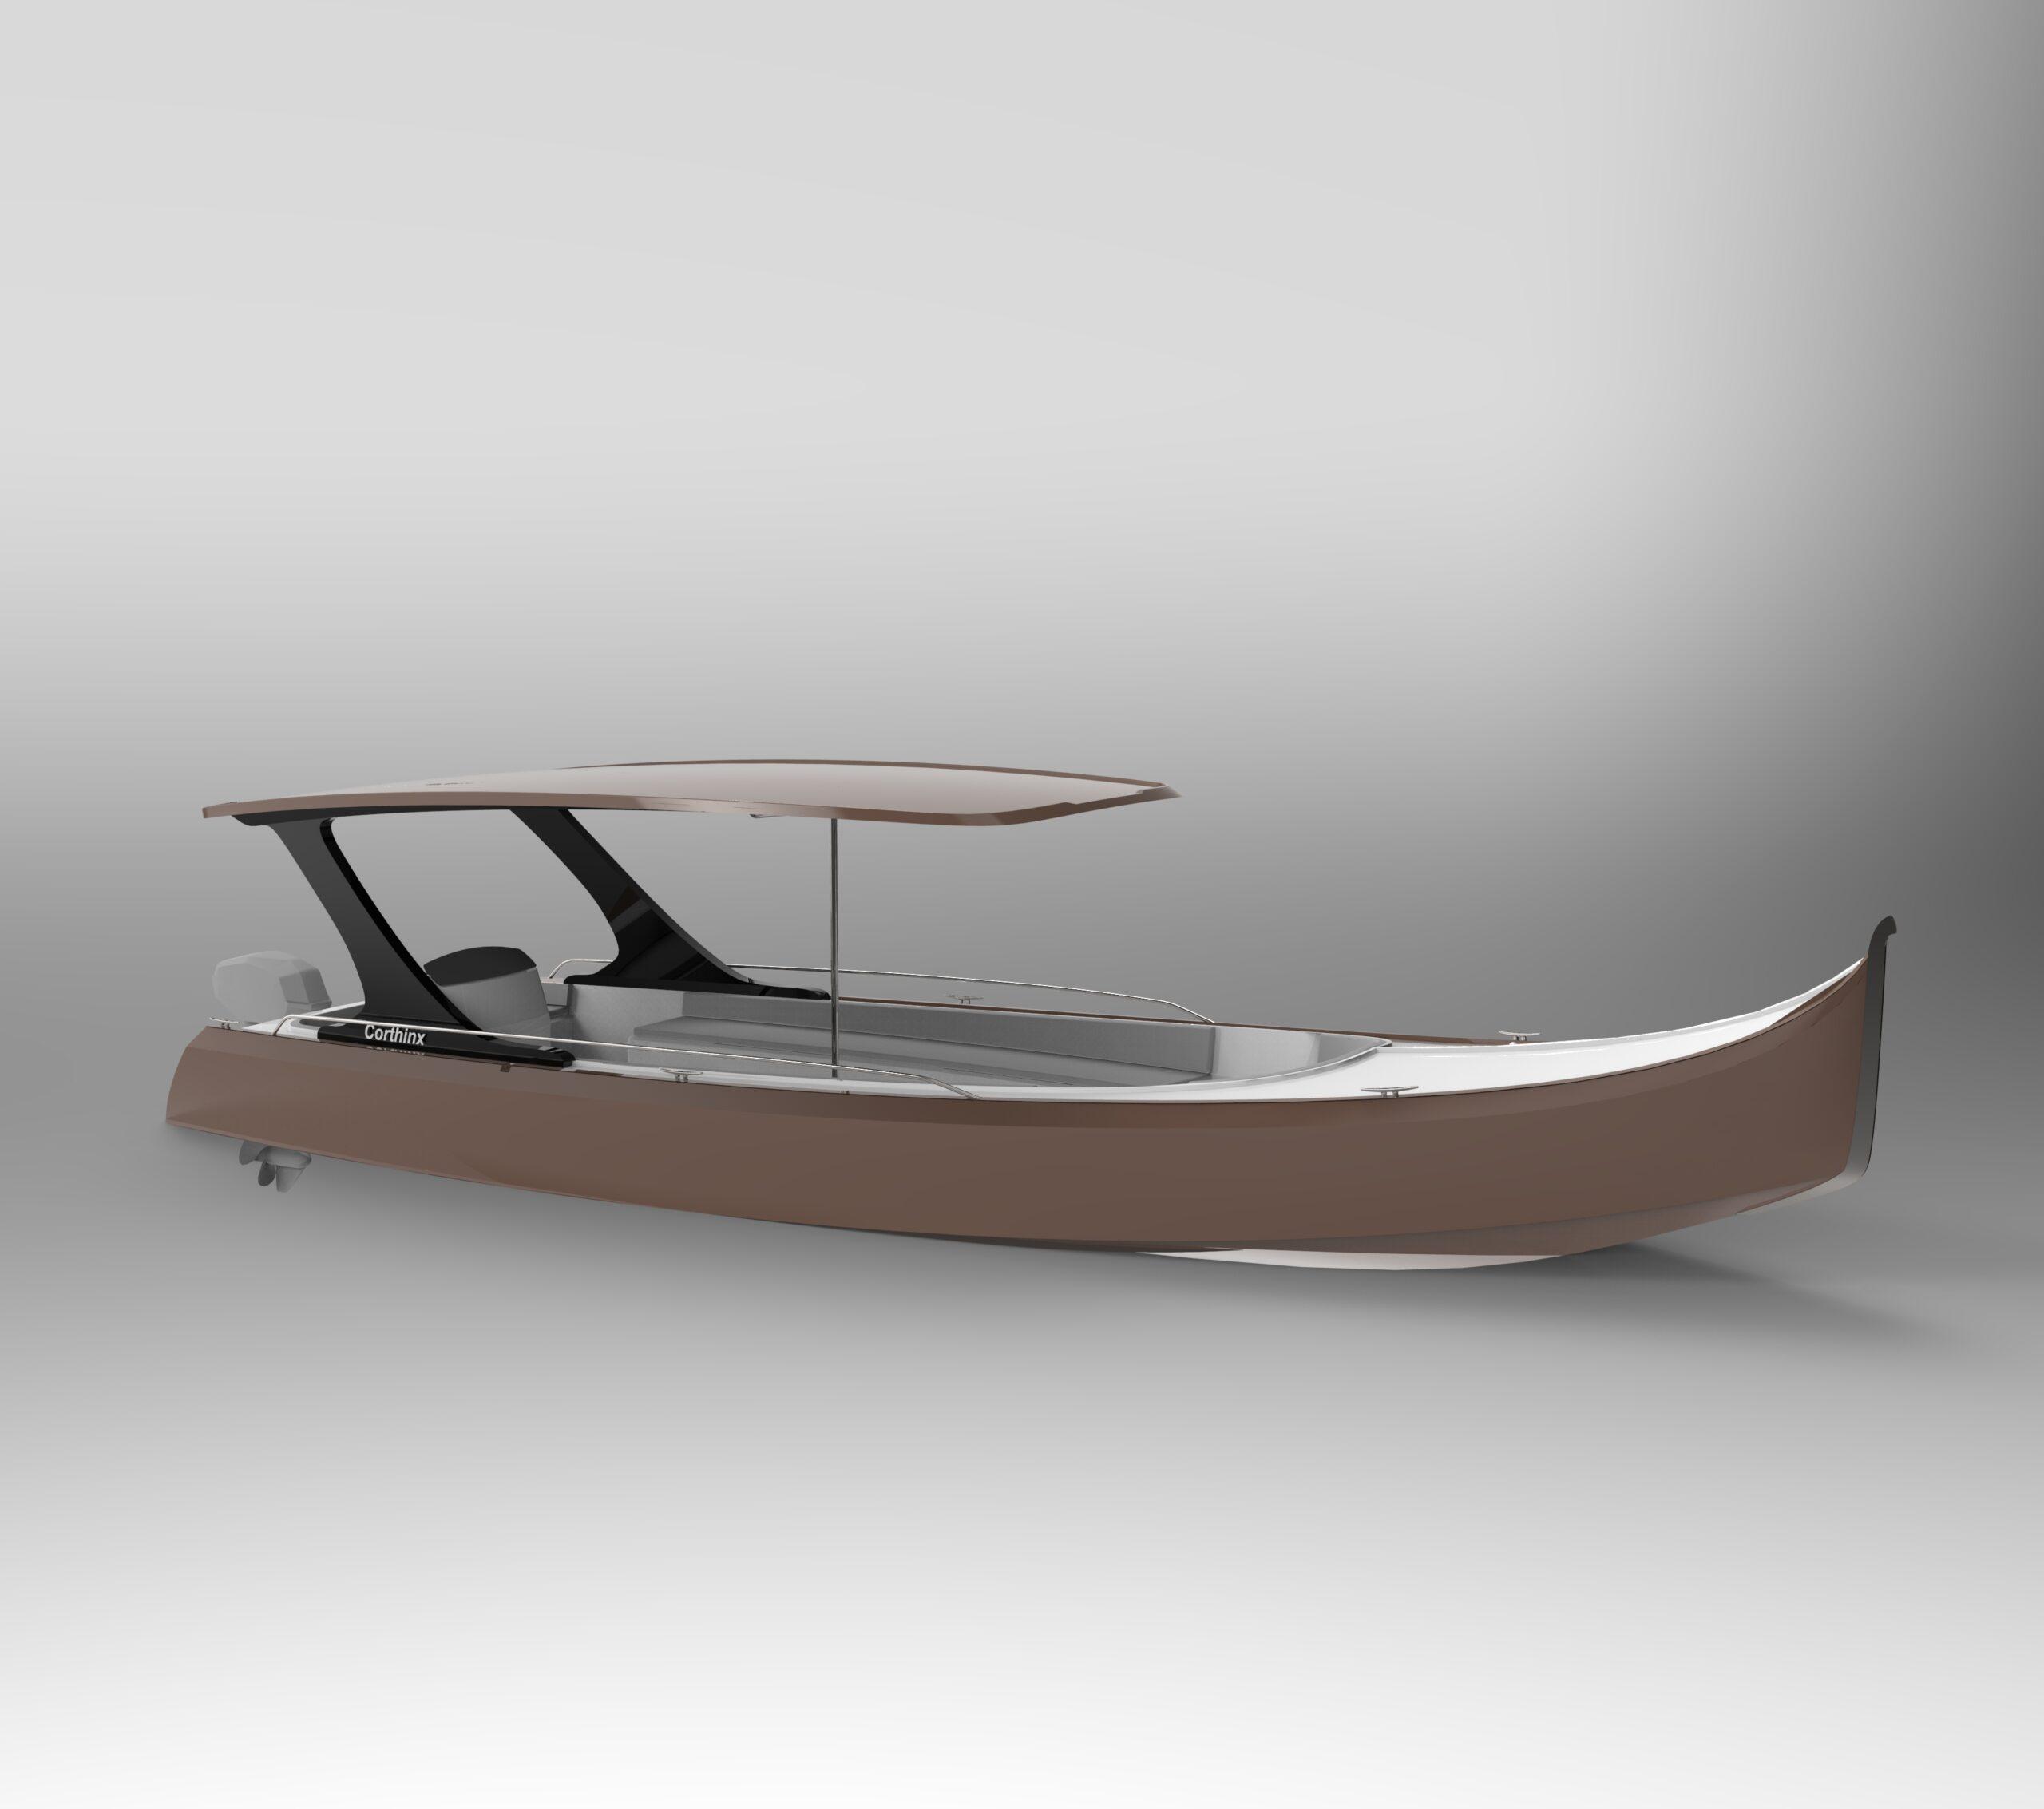 Gondole CX Daisy - Yacht Design Collective